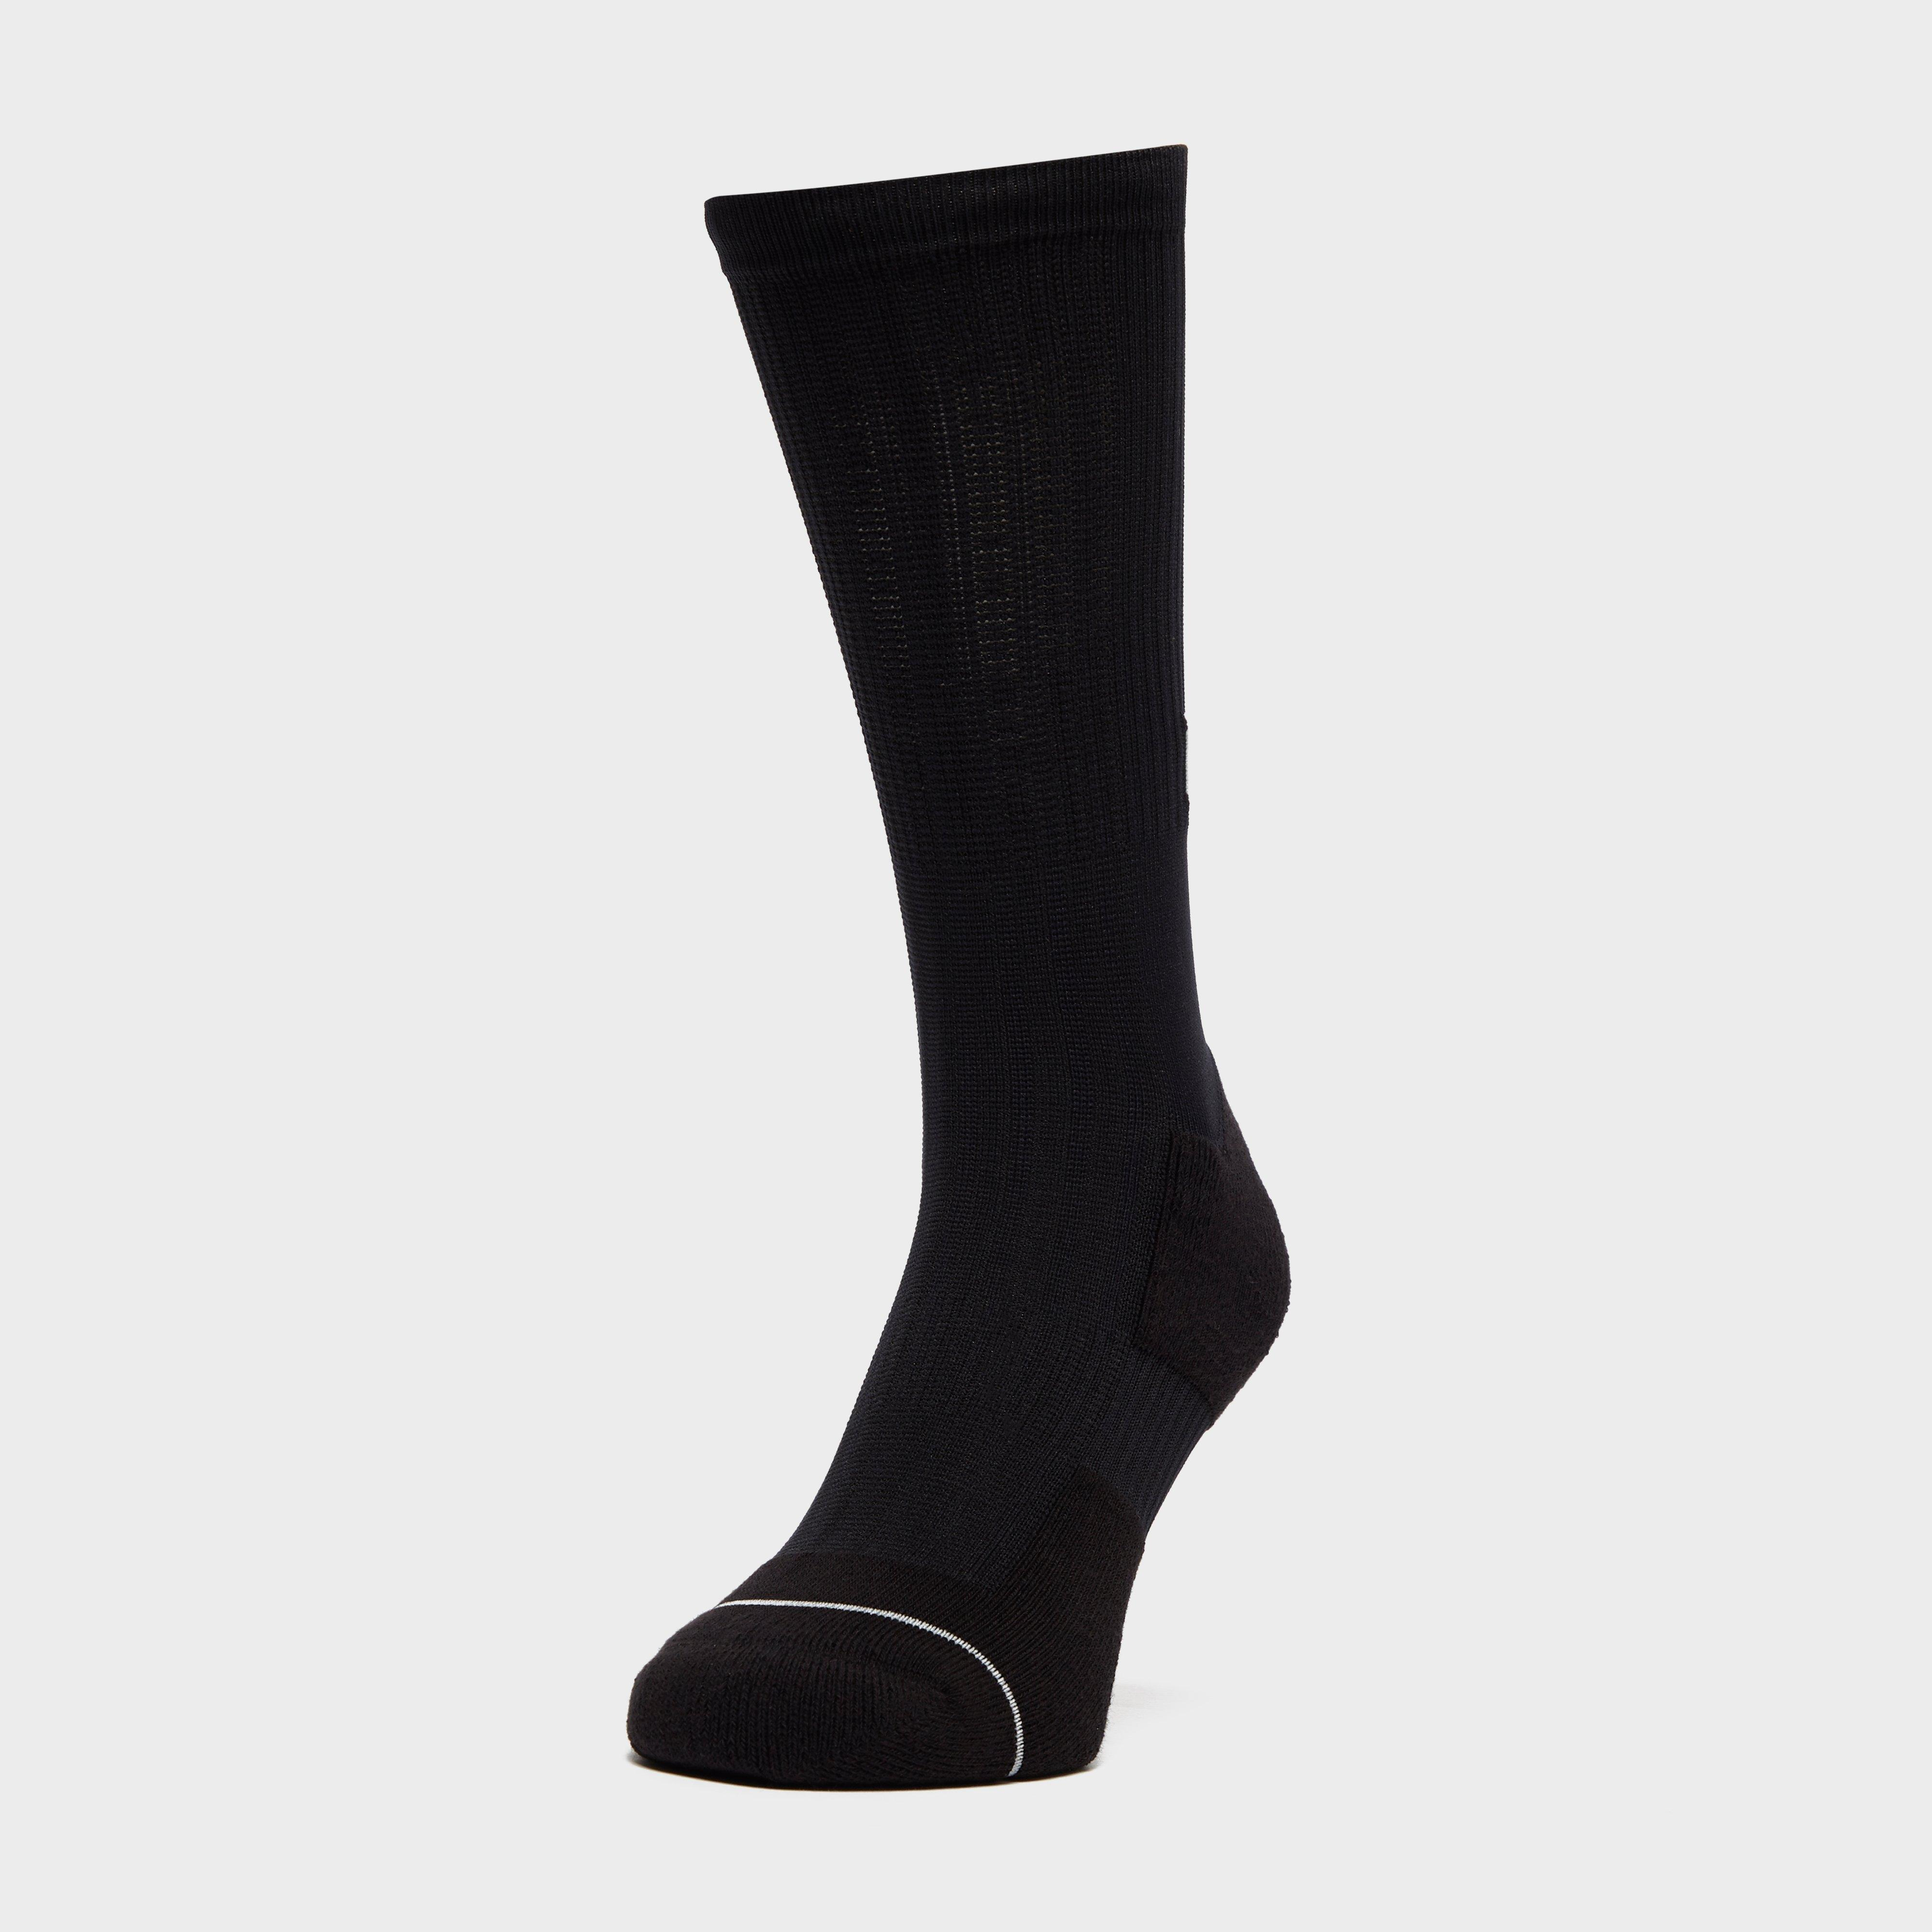 "FOX Fox 8"" Trail Cushion Sock - Black, Black"